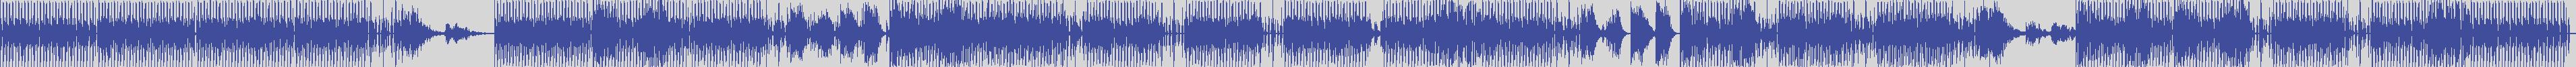 just_digital_records [JS1143] Homeboyz - Psyco [Baila Tribe Mix] audio wave form